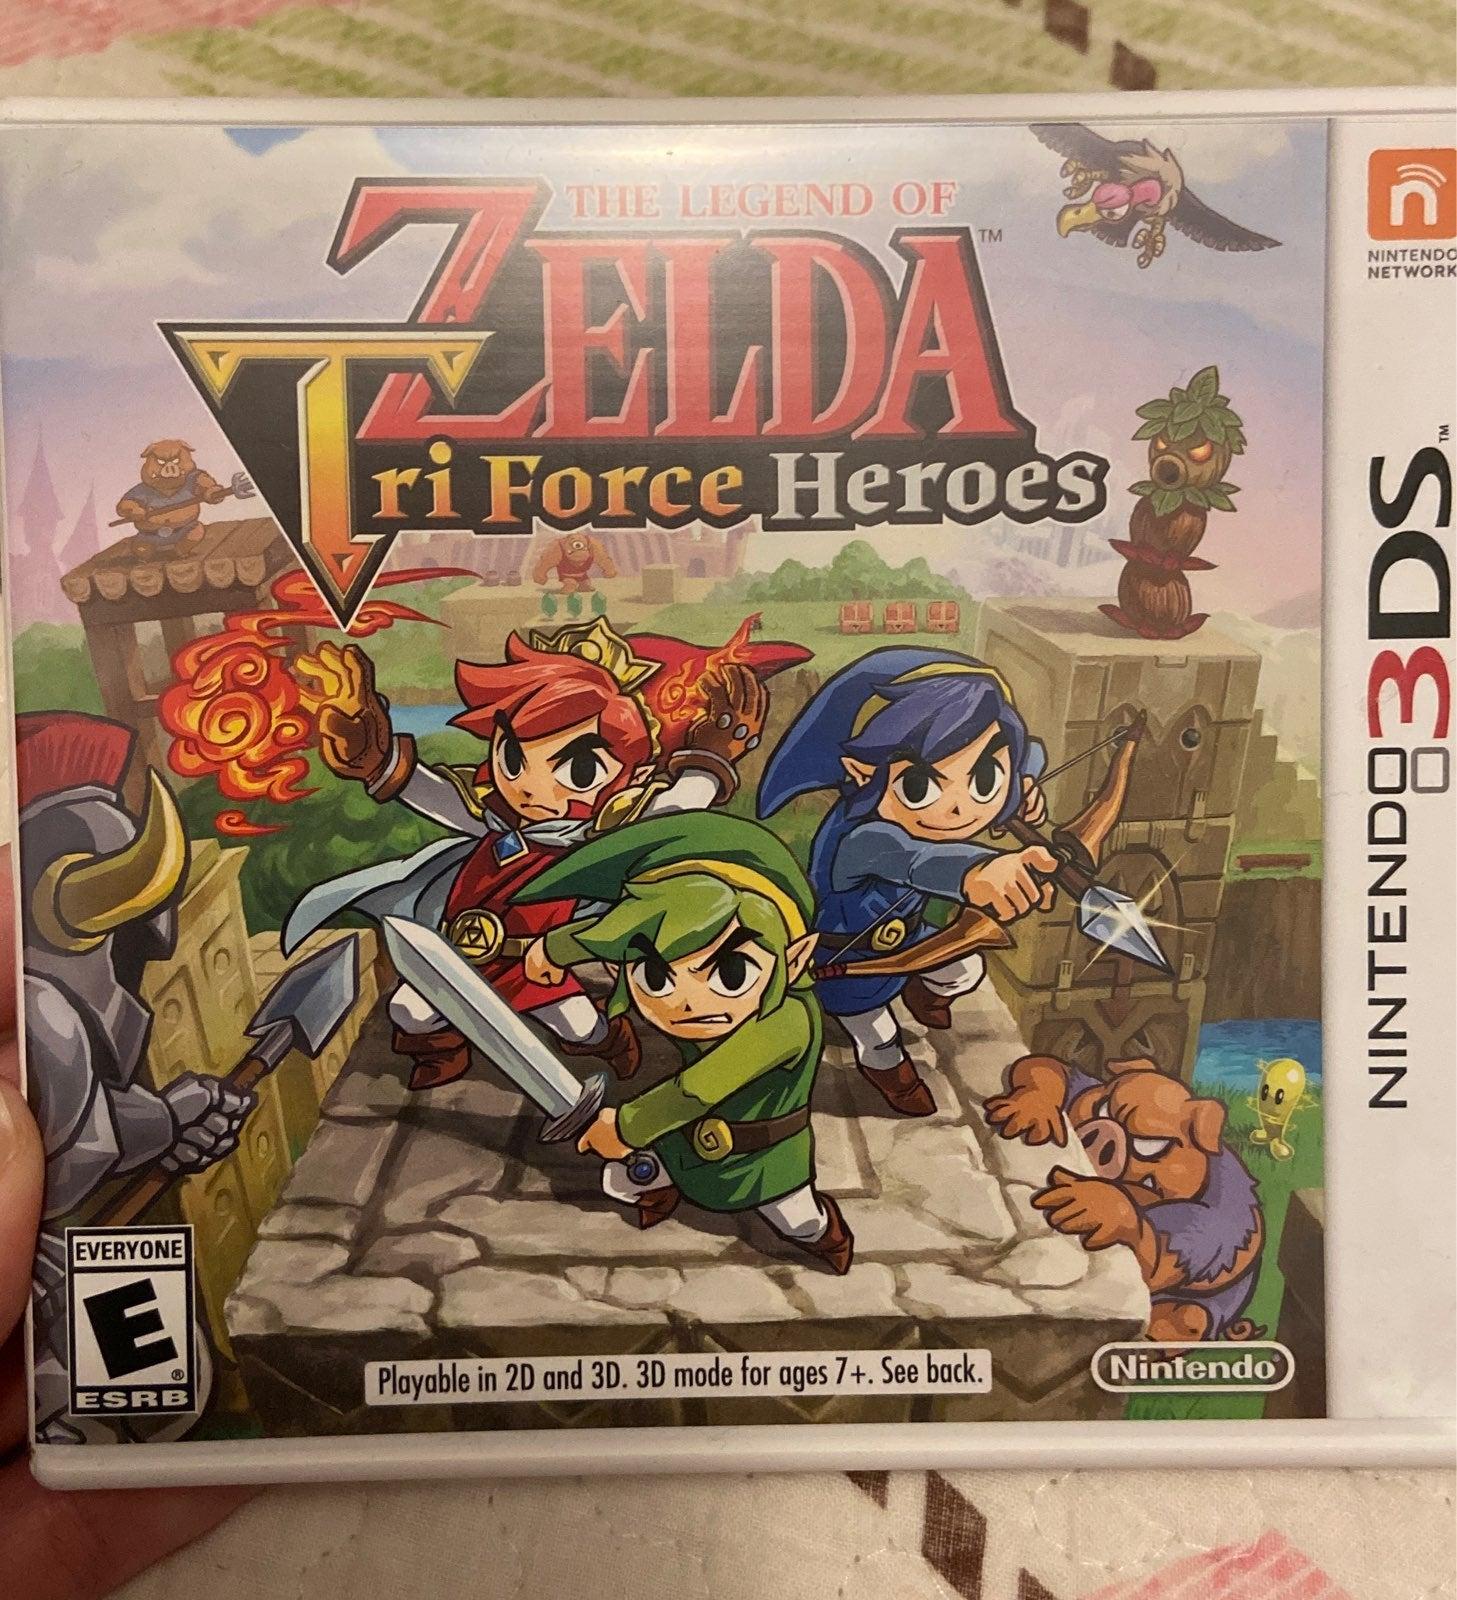 The Legend of Zelda: Tri Force Heroes on